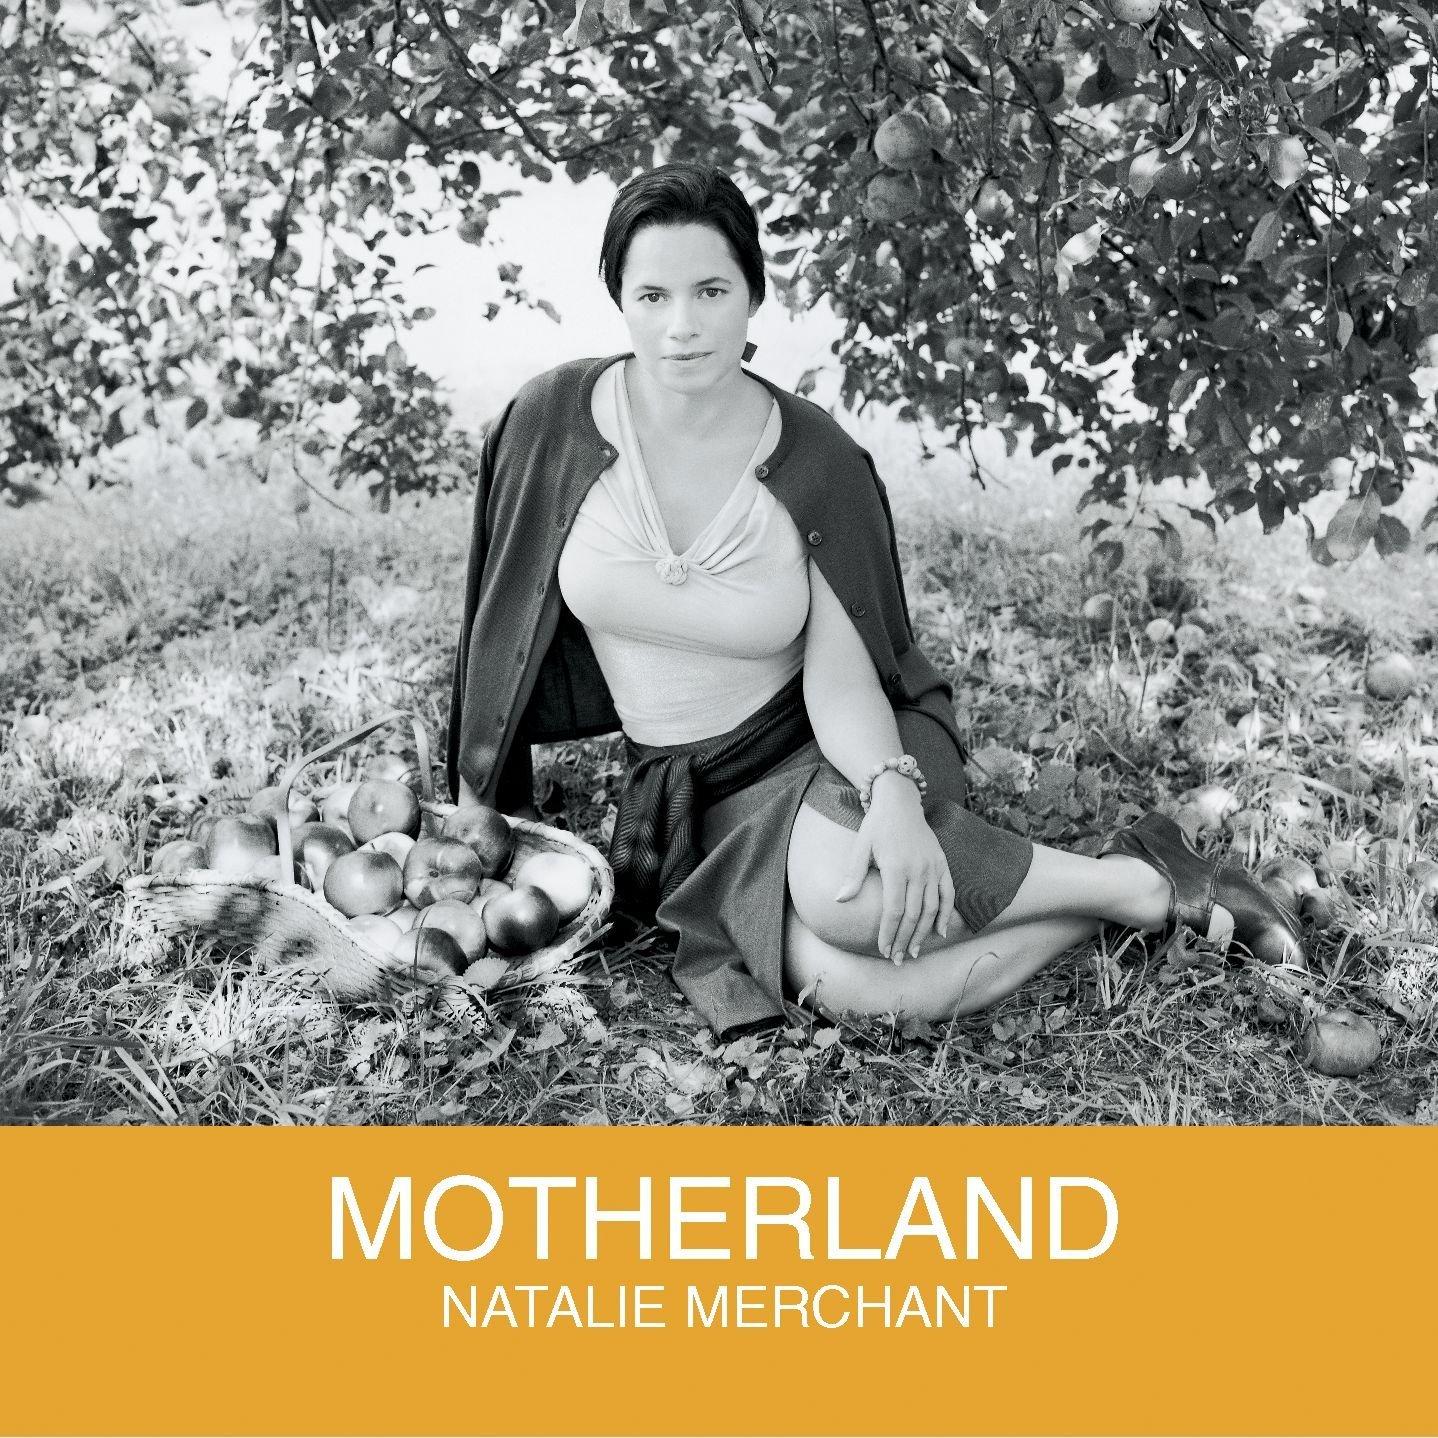 Natalie Merchant, Motherland